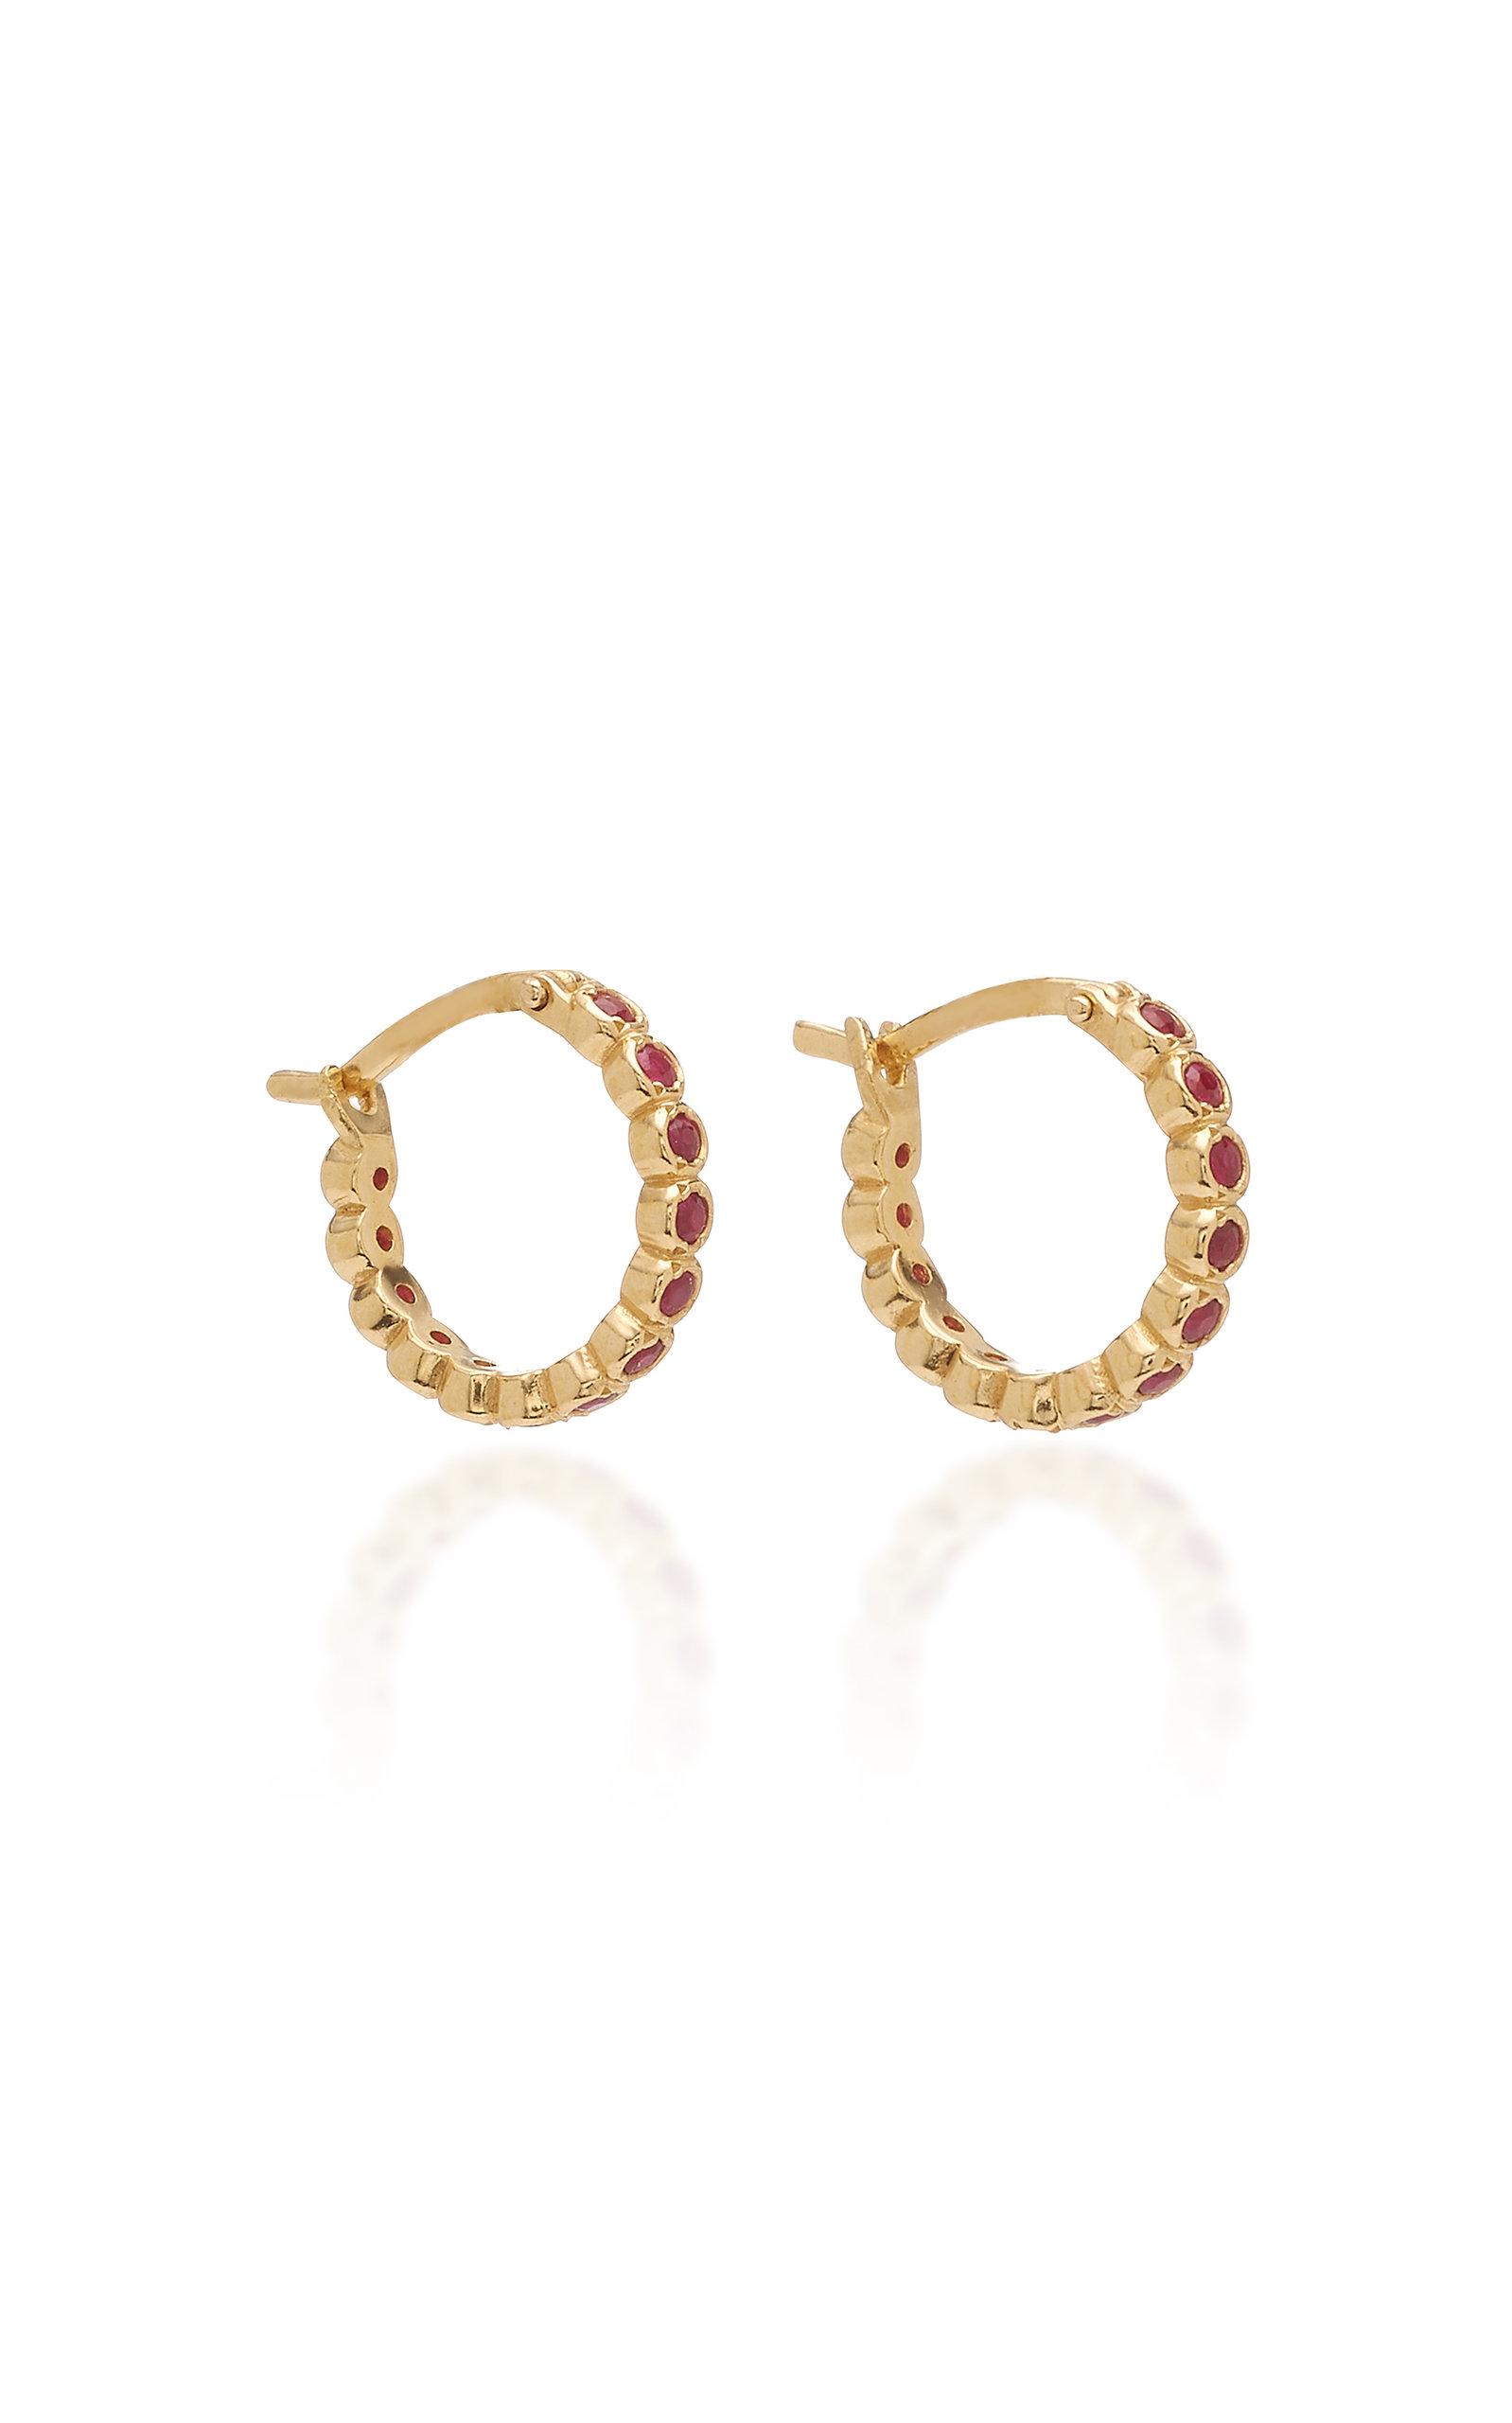 193cc33c6 Chloe Ruby and 18K Gold Hoop Earrings by Octavia Elizabeth | Moda ...